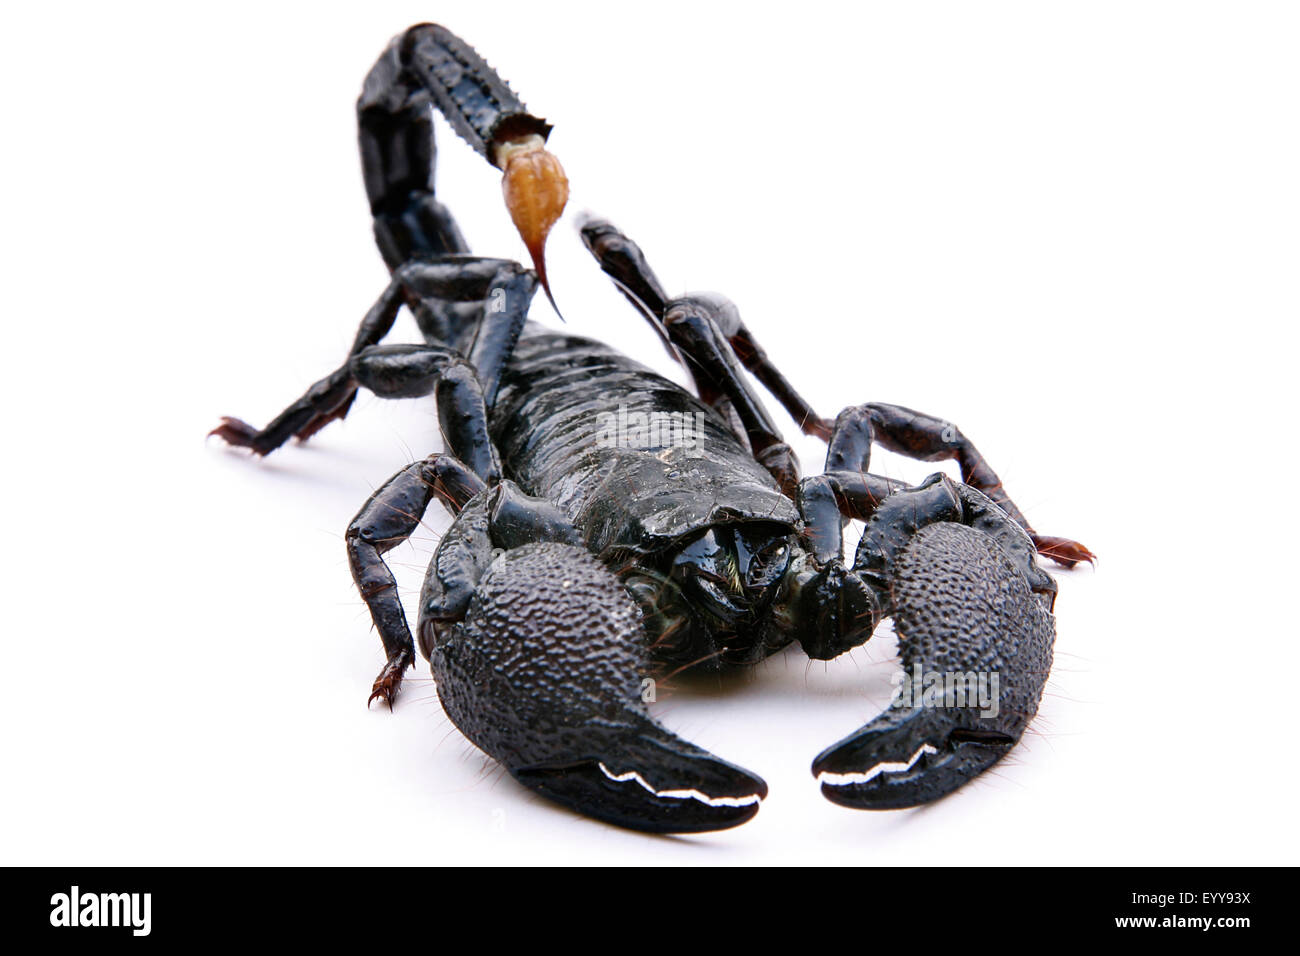 Black scorpion (Heterometrus scaber), hackled up scorpion - Stock Image